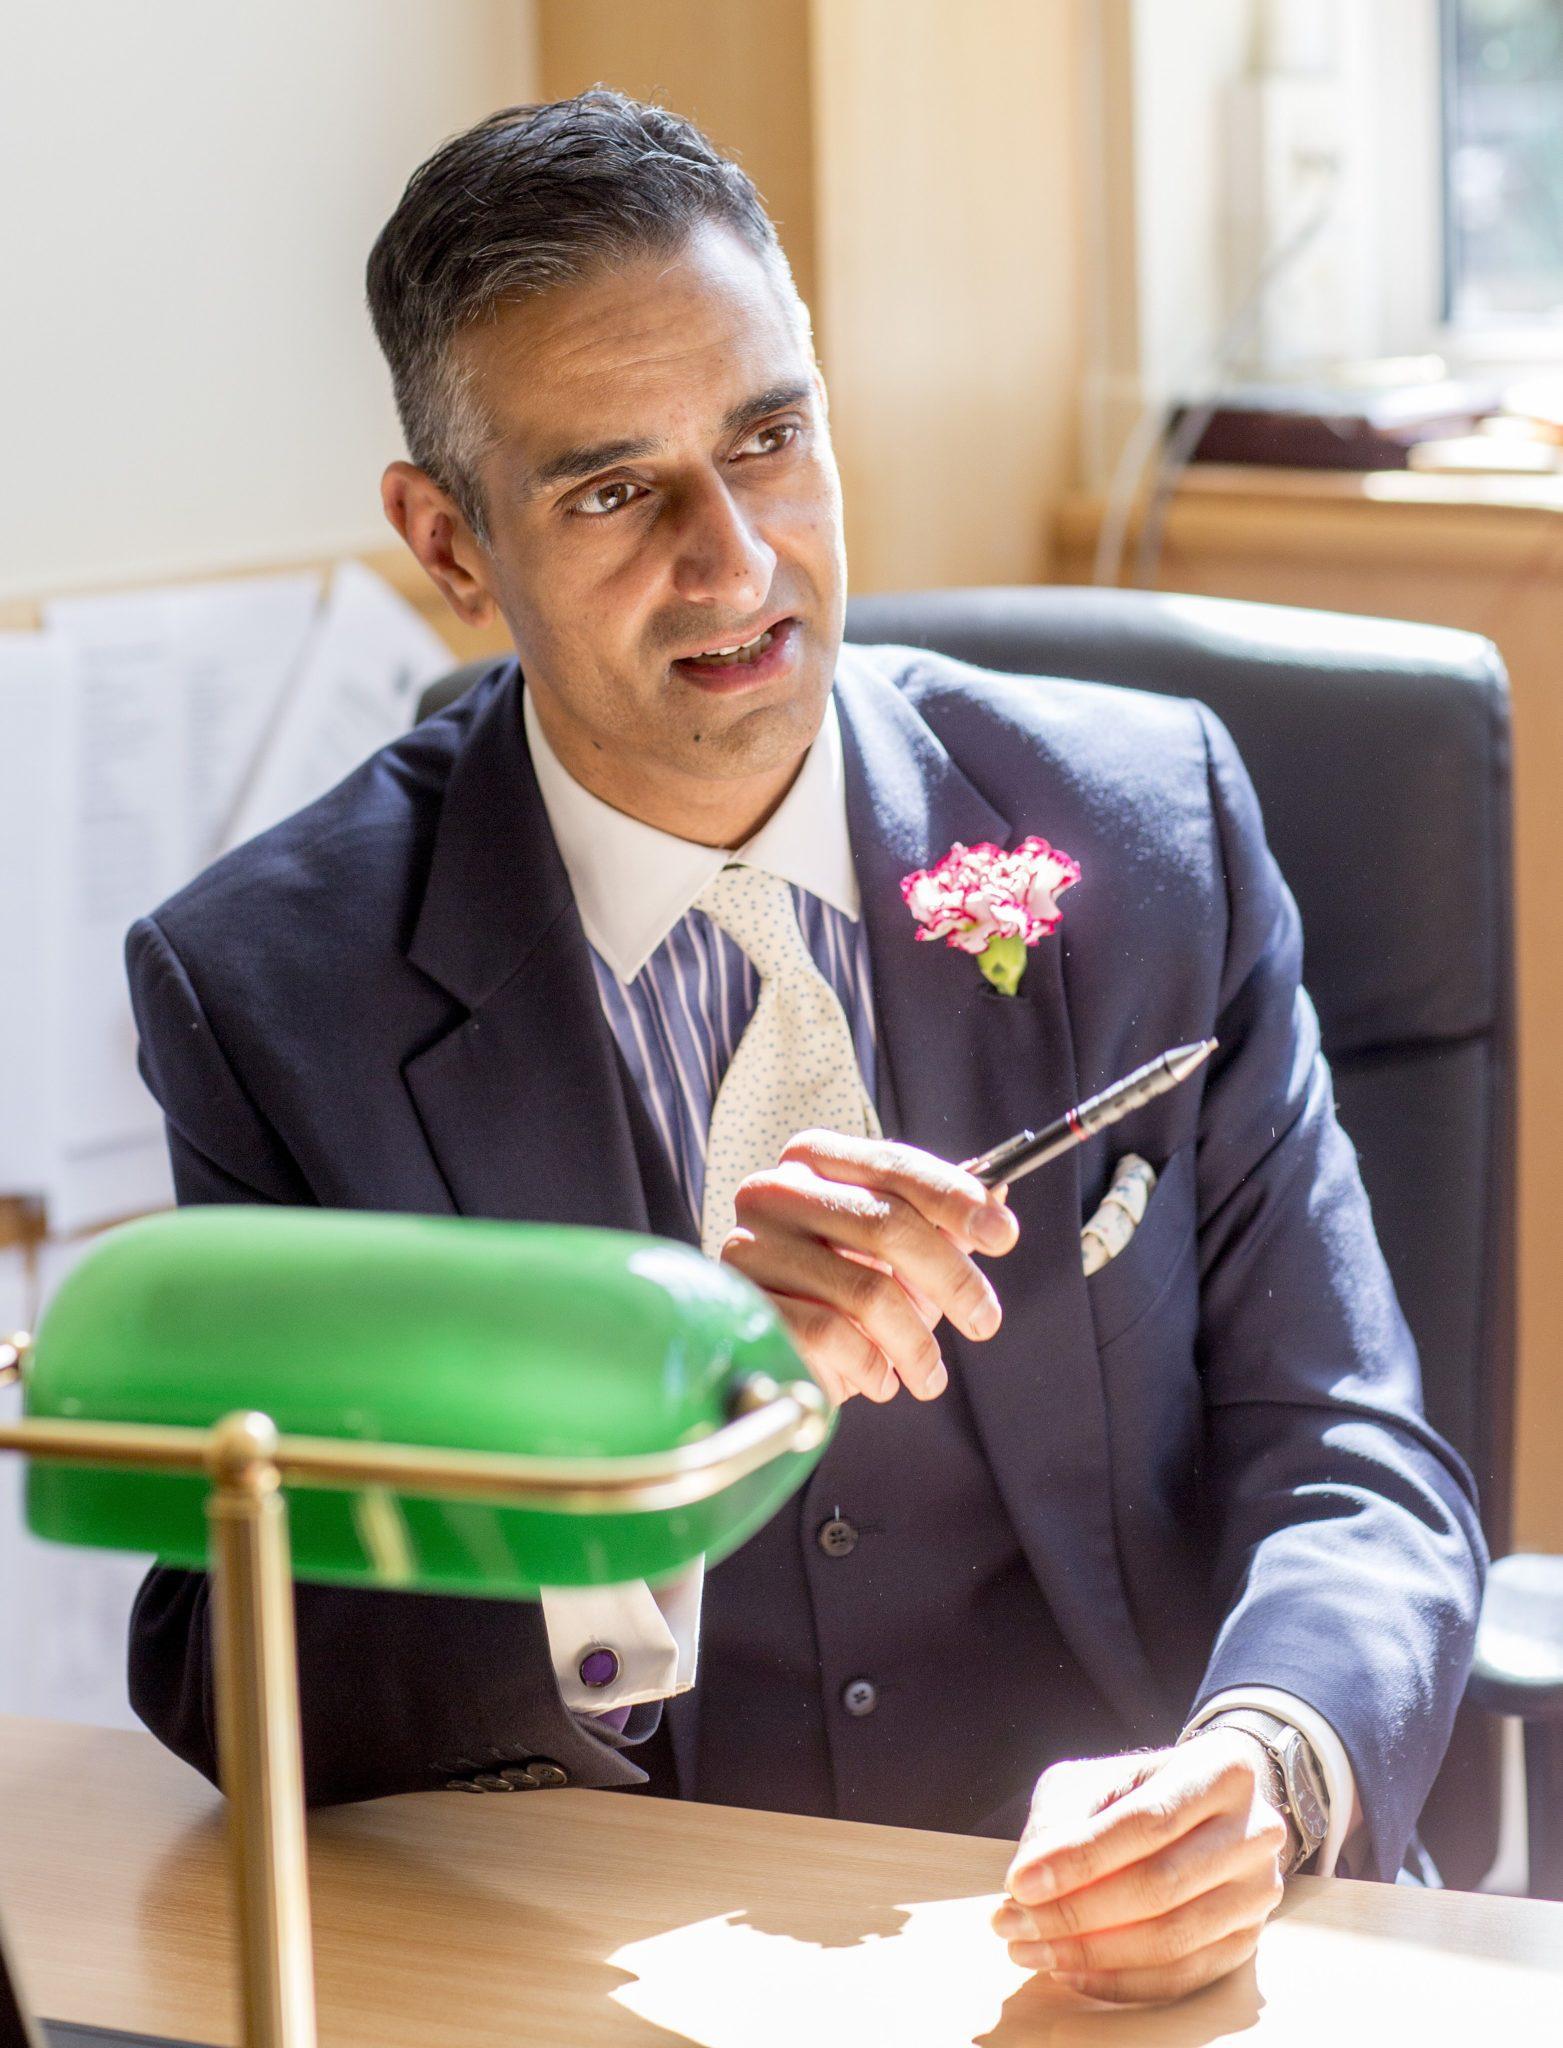 Dr Millan Sachania | Streatham & Clapham High School